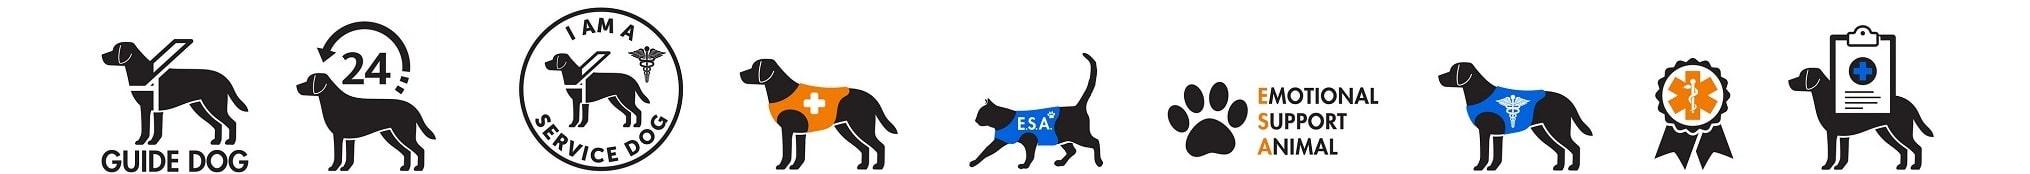 Service Animals Emotional Comfort Pets Training Property Managers Robert Locke